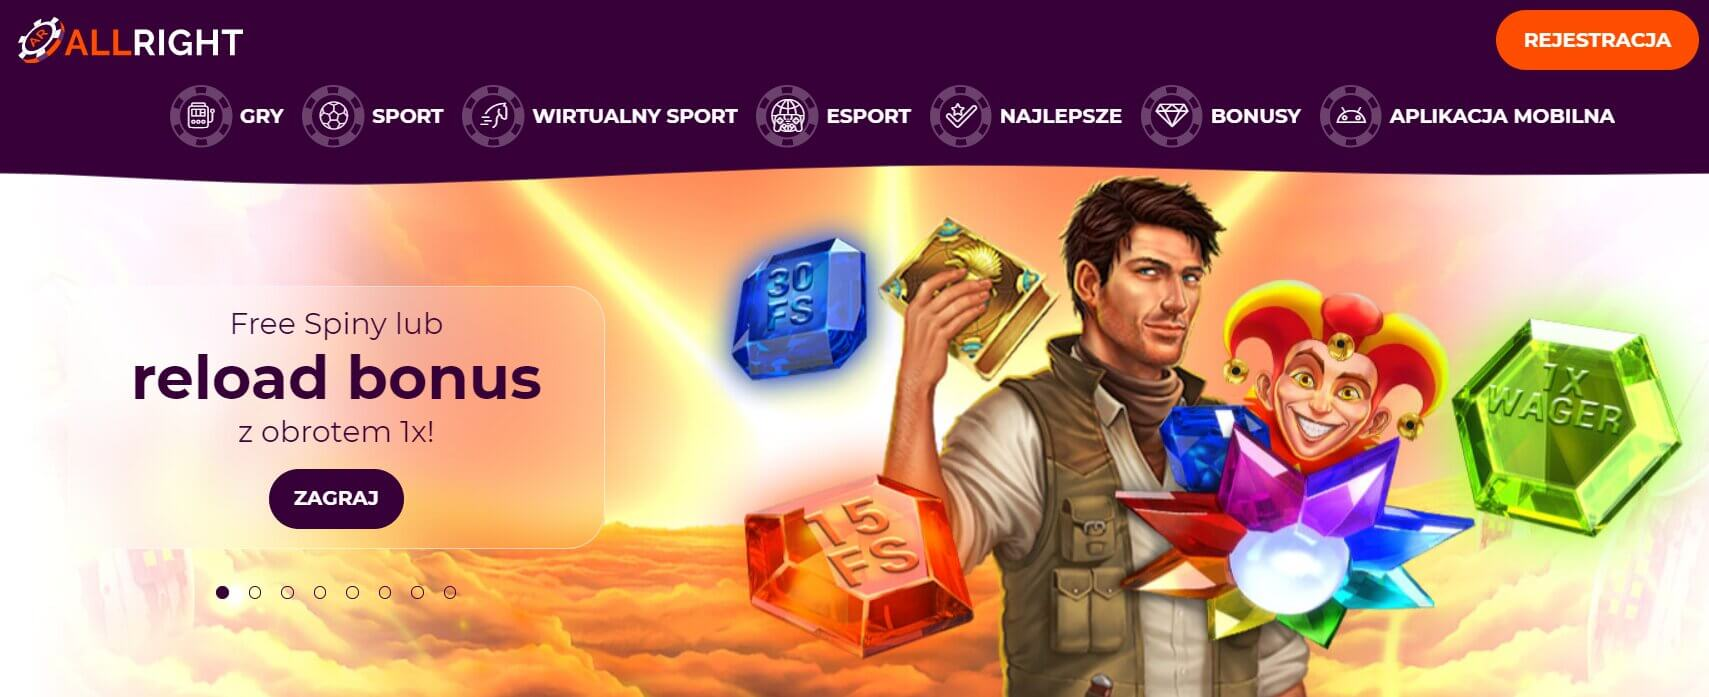 allright casino bonus screenshot